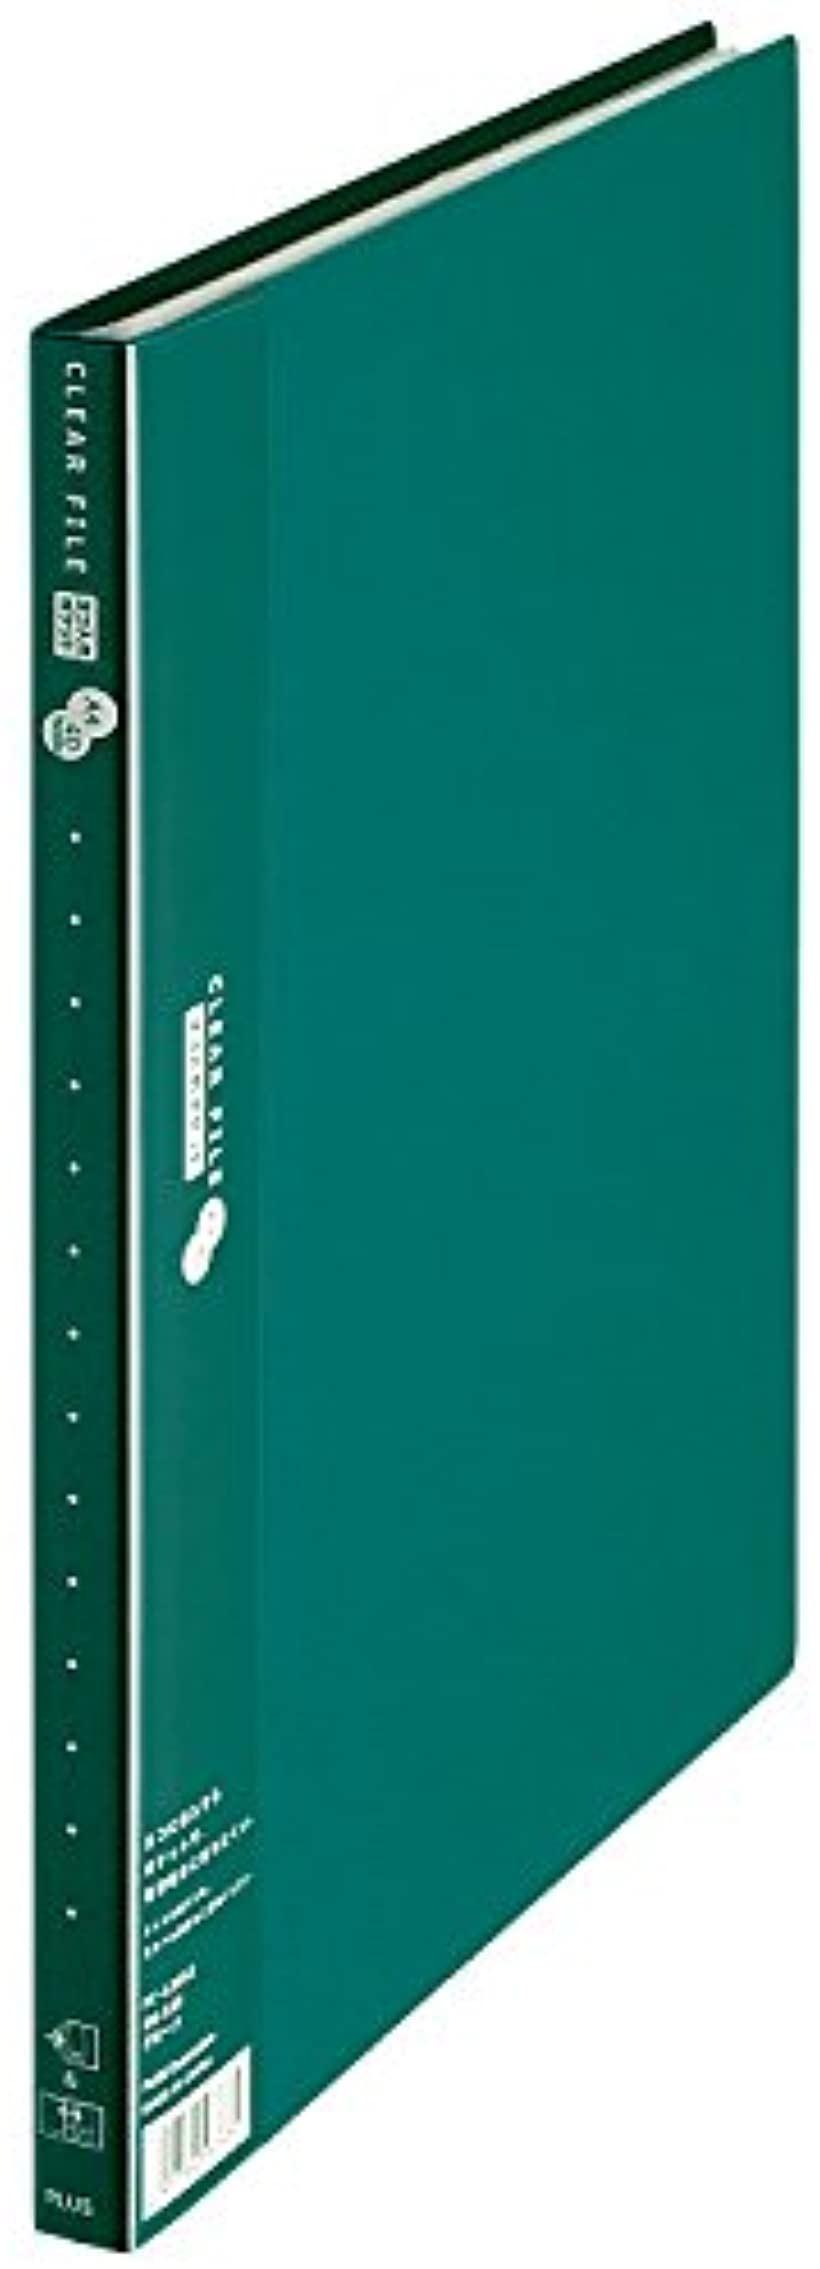 PLUS プラス クリアファイル スーパーエコノミー 横入れ 86-233 交換無料 A3 A4 20枚 グリーン メーカー直送